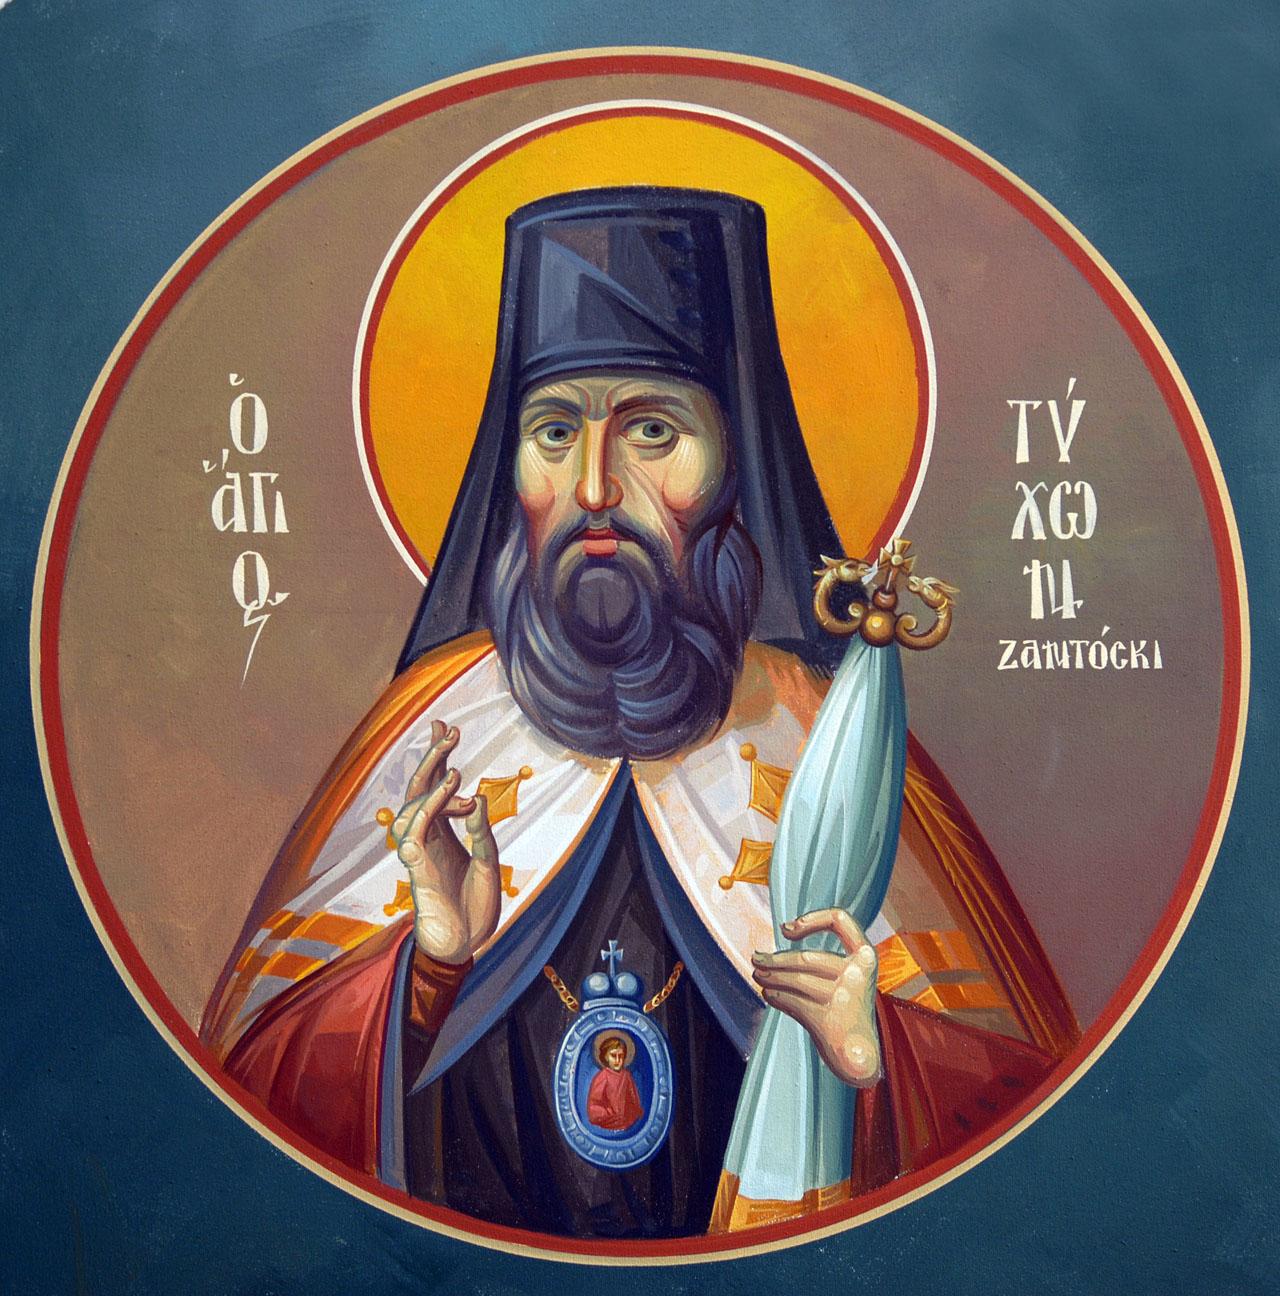 Tikhon of Zadonsk